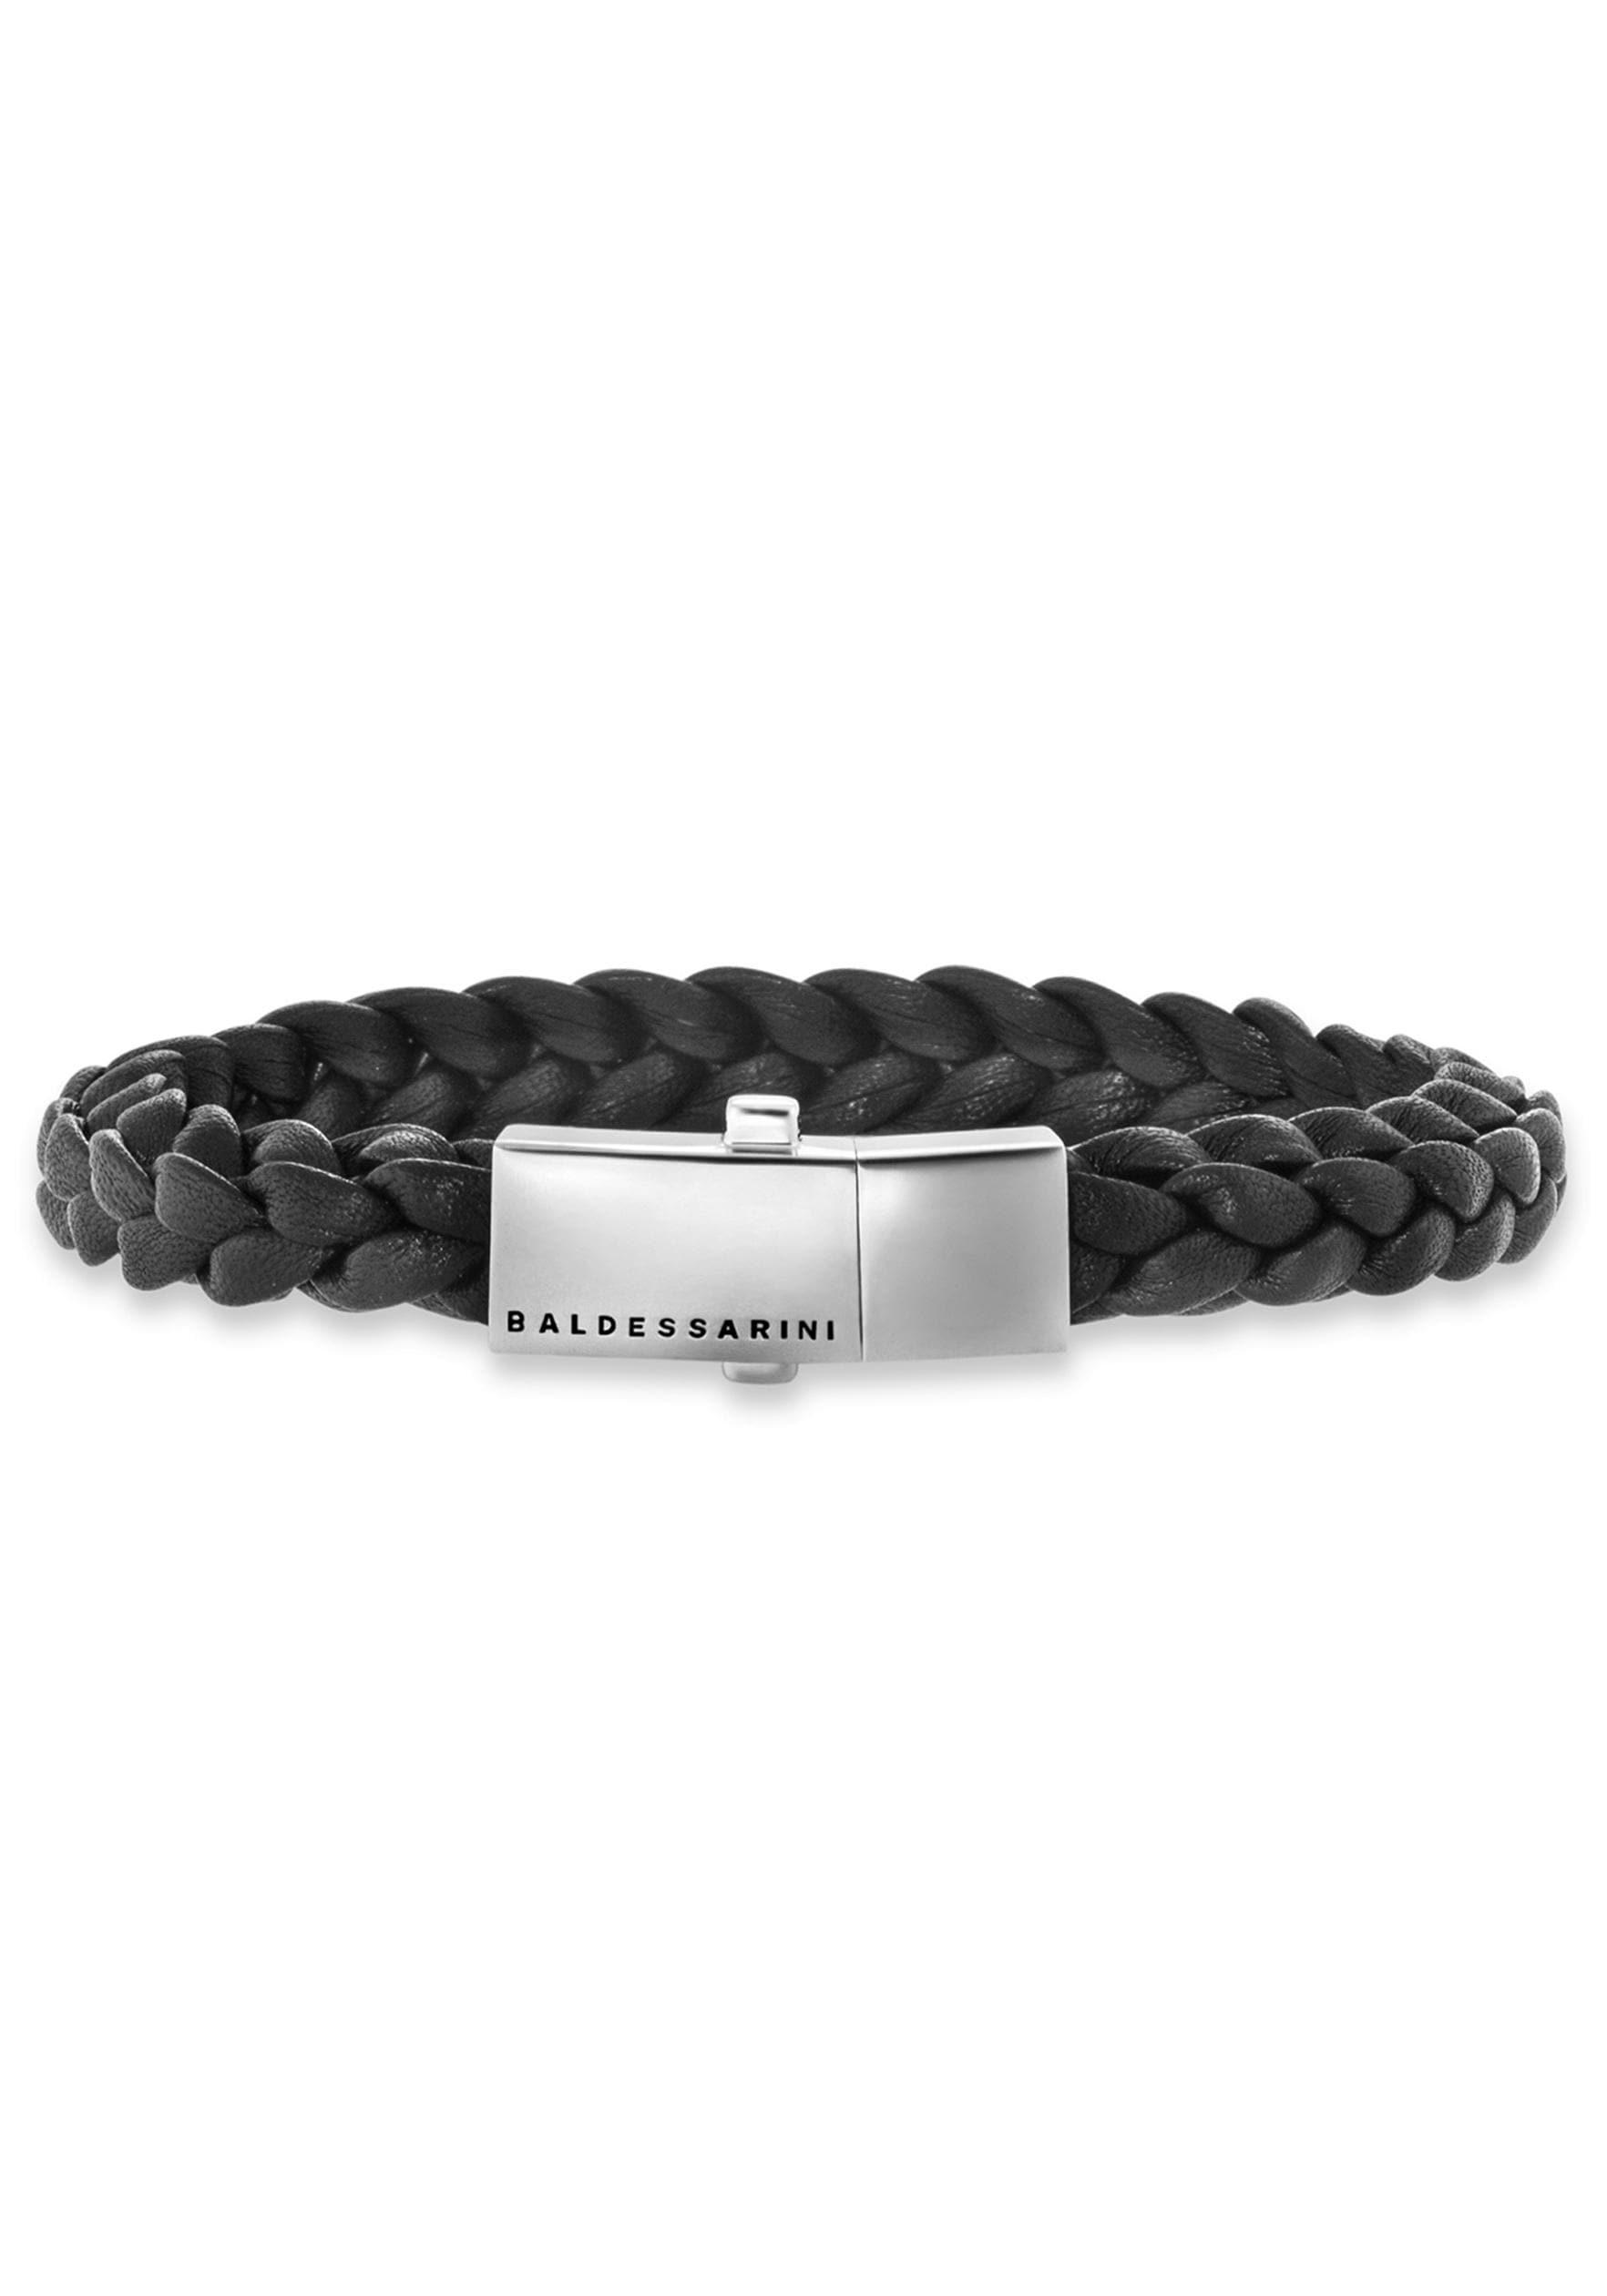 BALDESSARINI Armband Y1065B/90/00/19 21 23 | Schmuck | Baldessarini